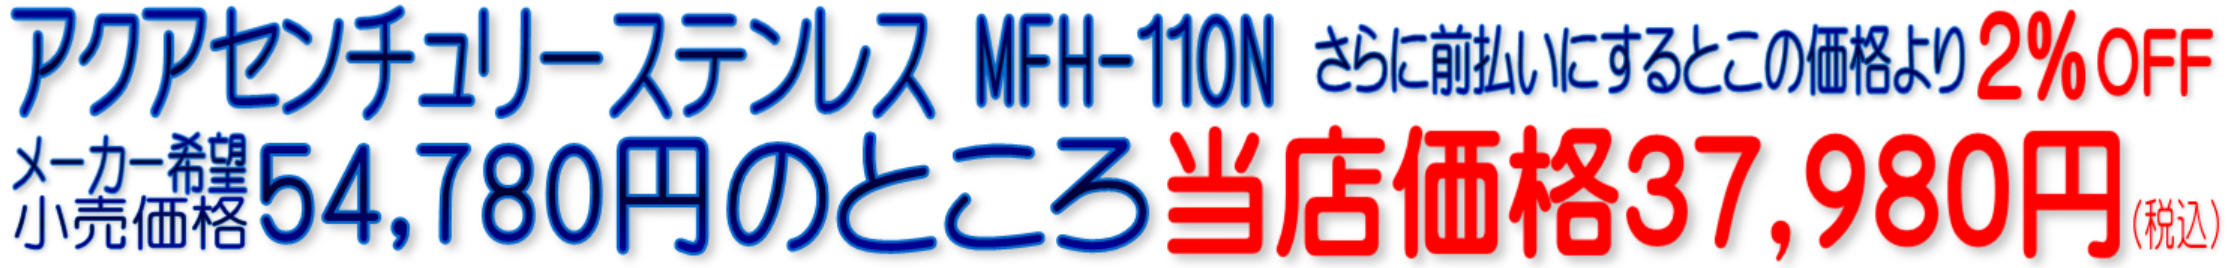 https://www.eco-morikawa.jp/kakaku/zenken/MFH-110N.png